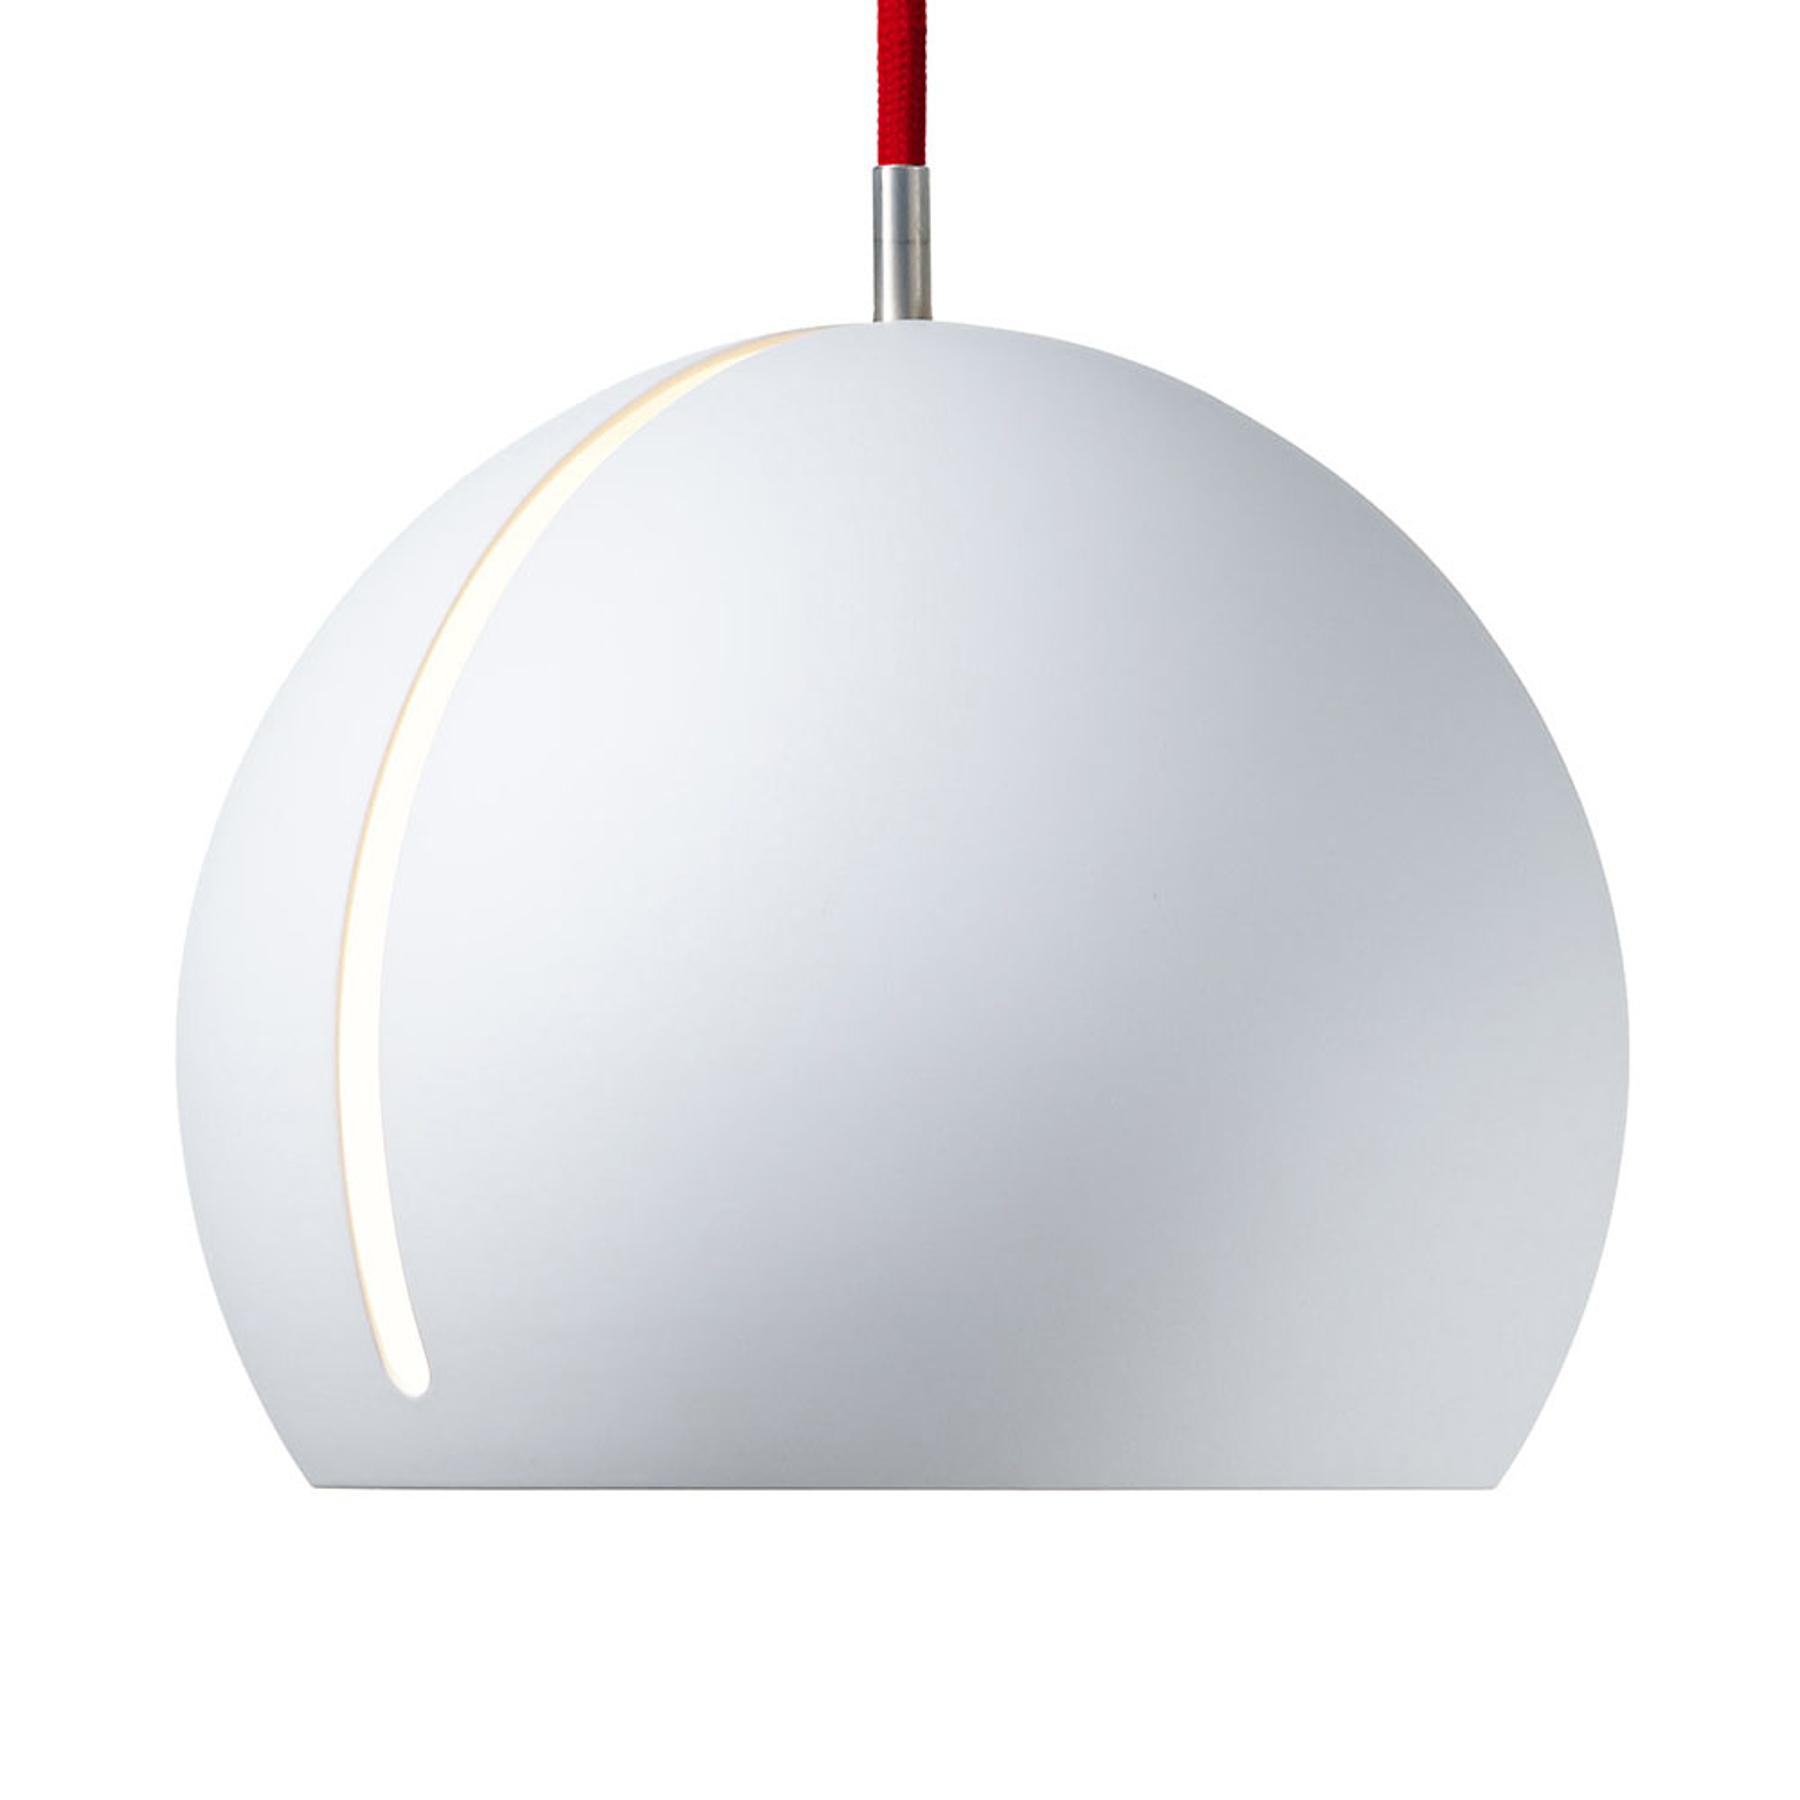 Nyta Tilt Globe Hängelampe Kabel 3m rot weiß